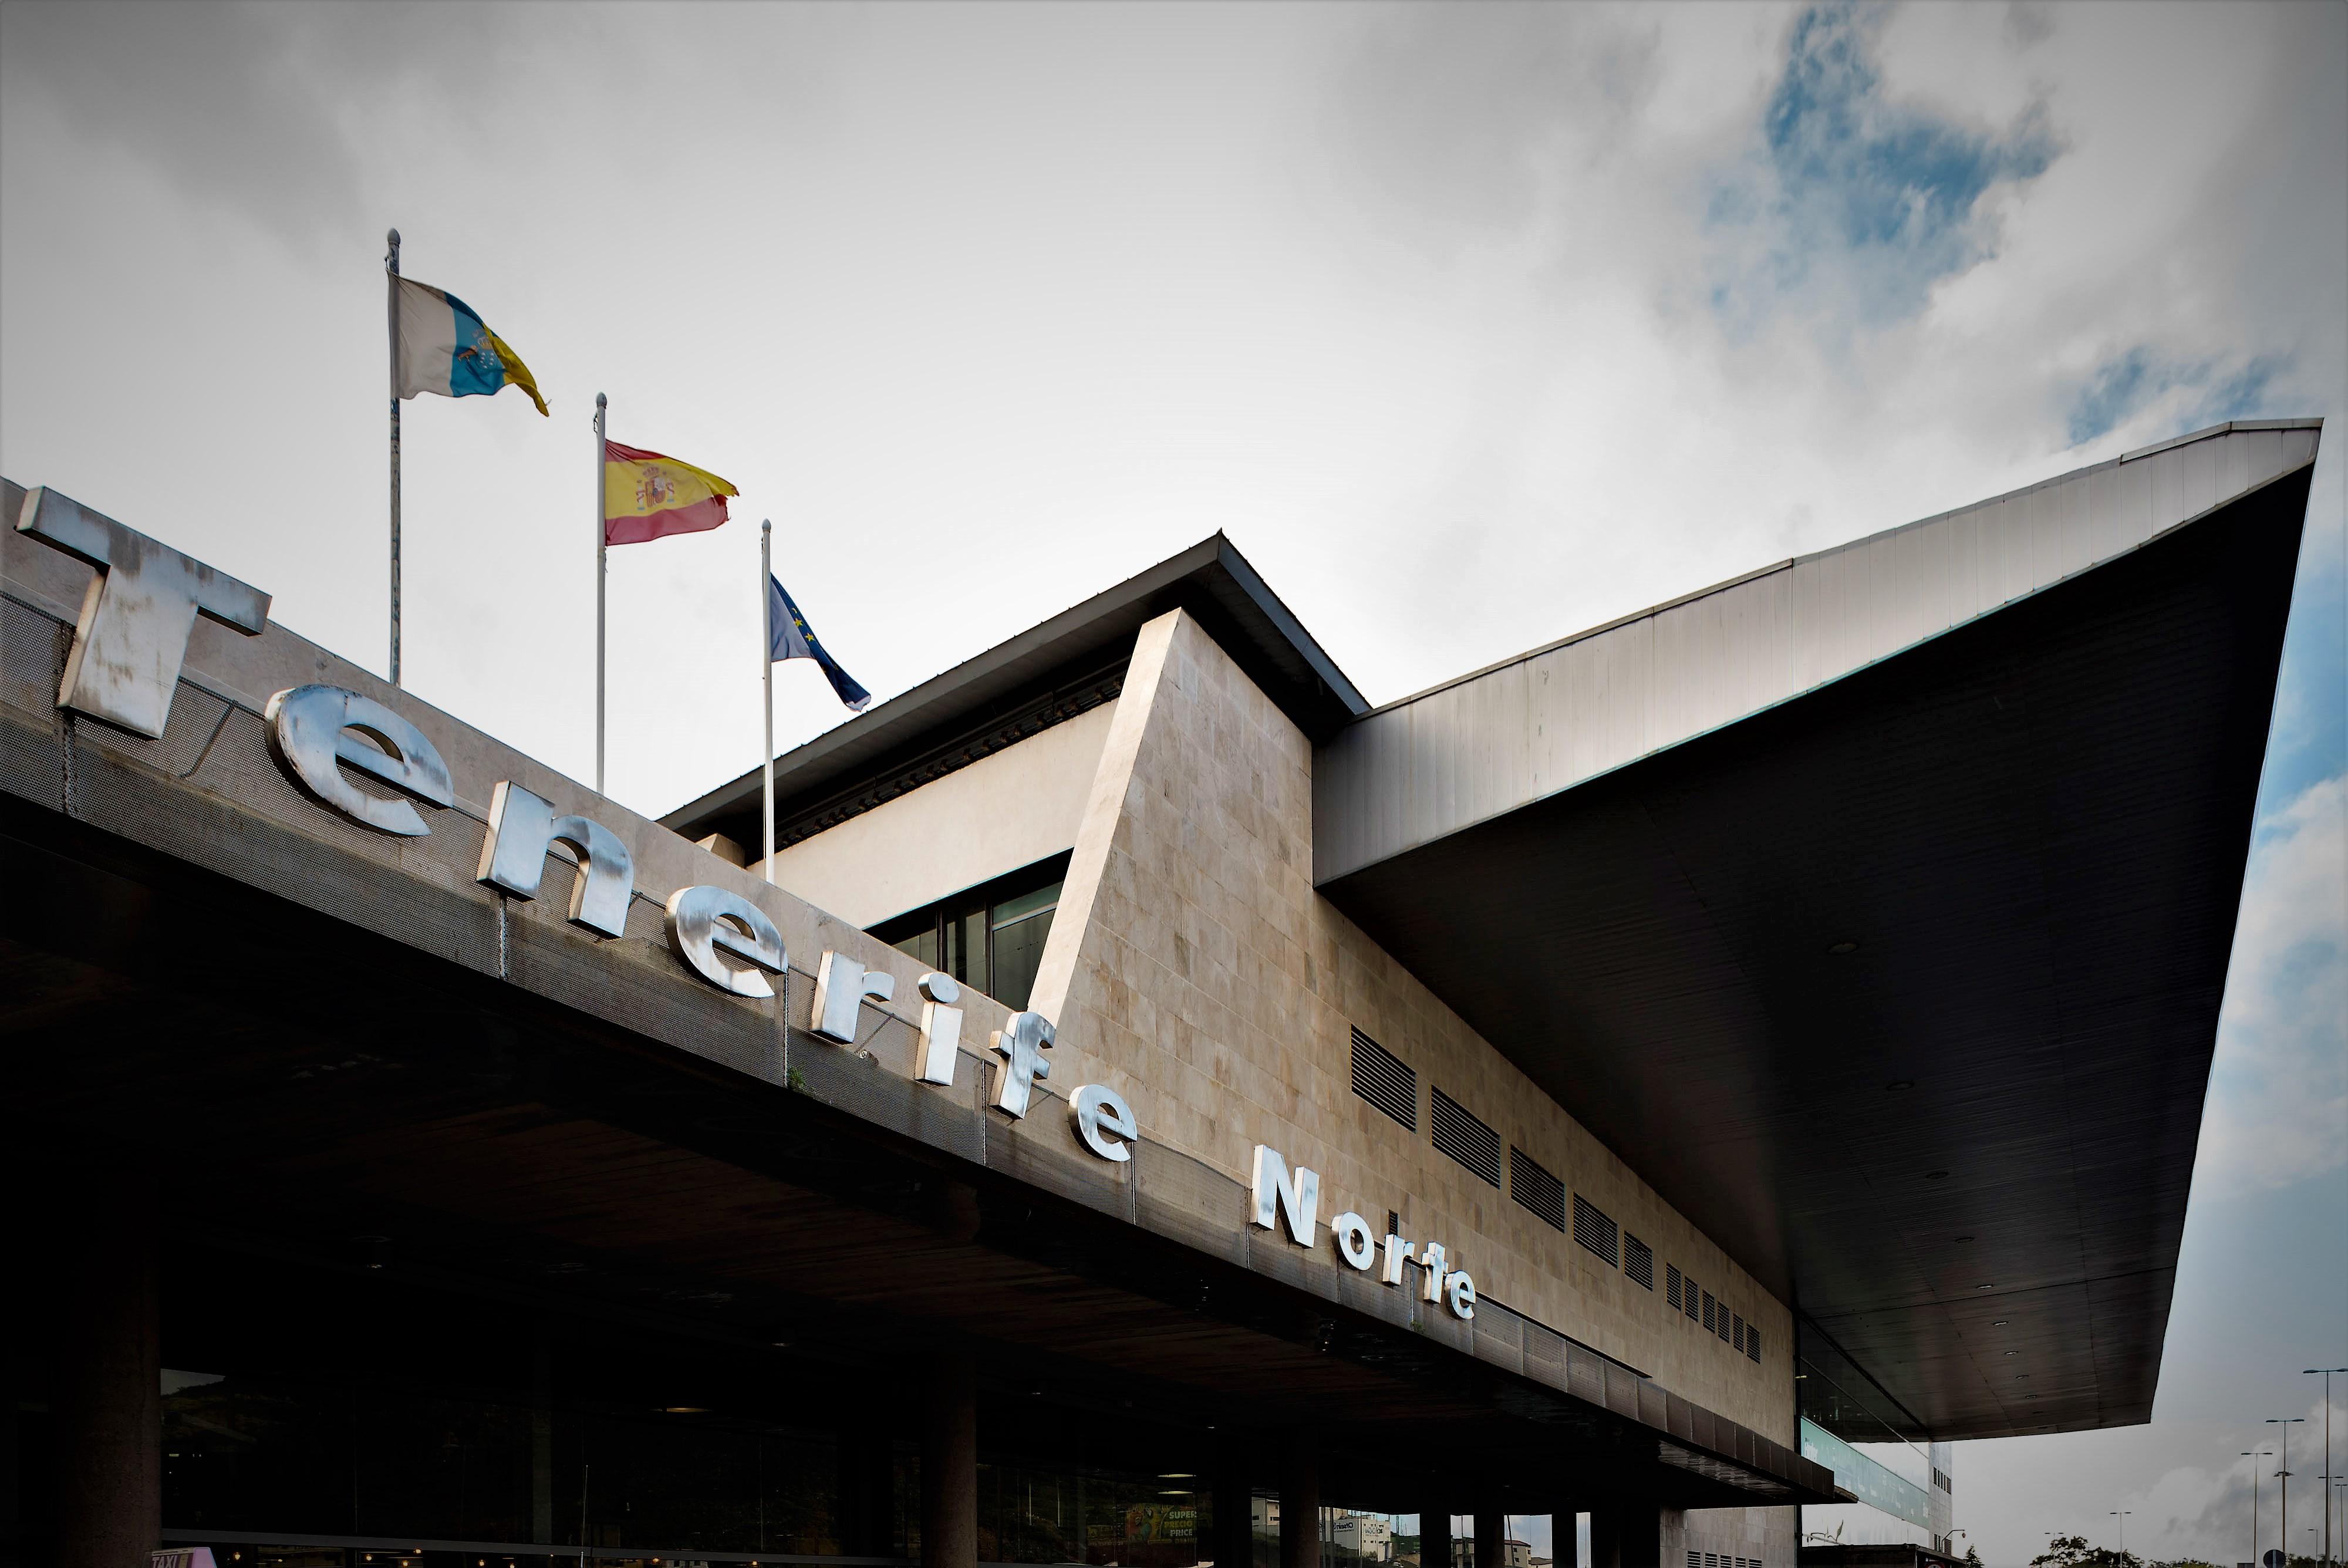 Aeropuerto de Tenerife Norte Los Rodeos (Северный аэропорт Тенерифе Лос-Родеос)